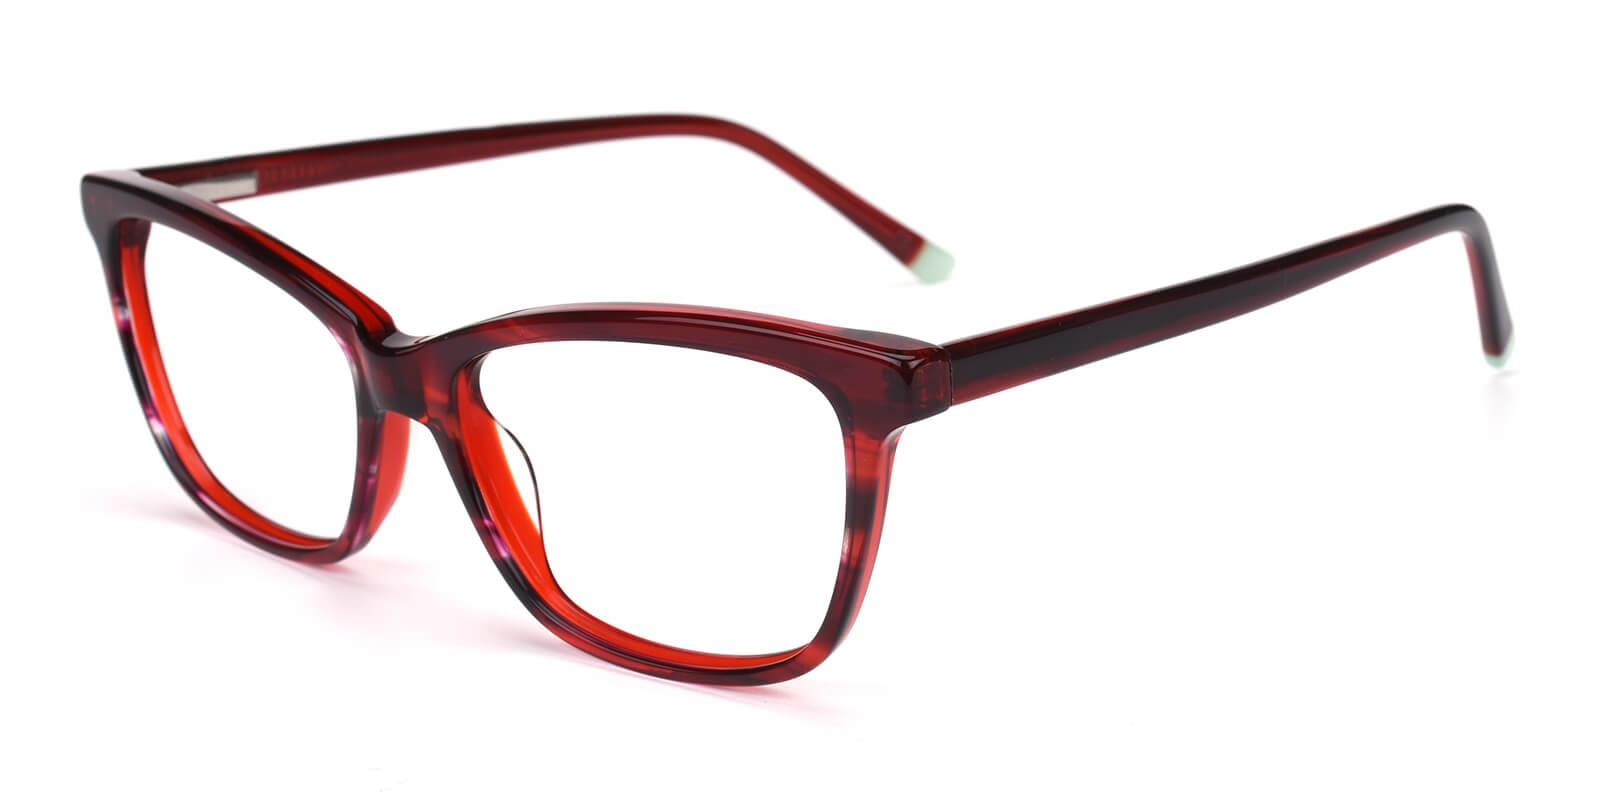 Ezra-Red-Cat / Rectangle-Acetate-Eyeglasses-detail